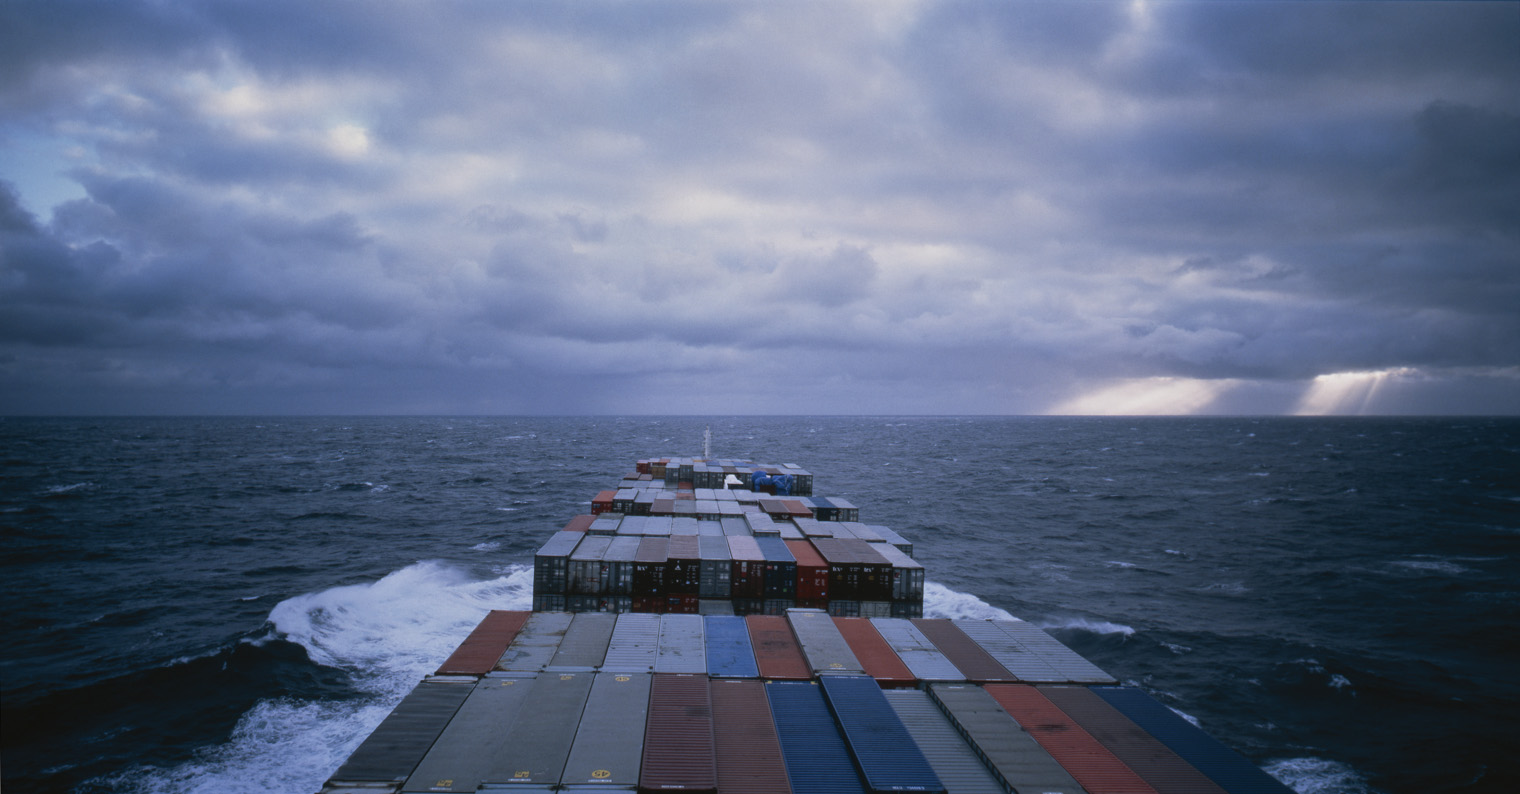 Panorama. Mid-Atlantic, November 1993